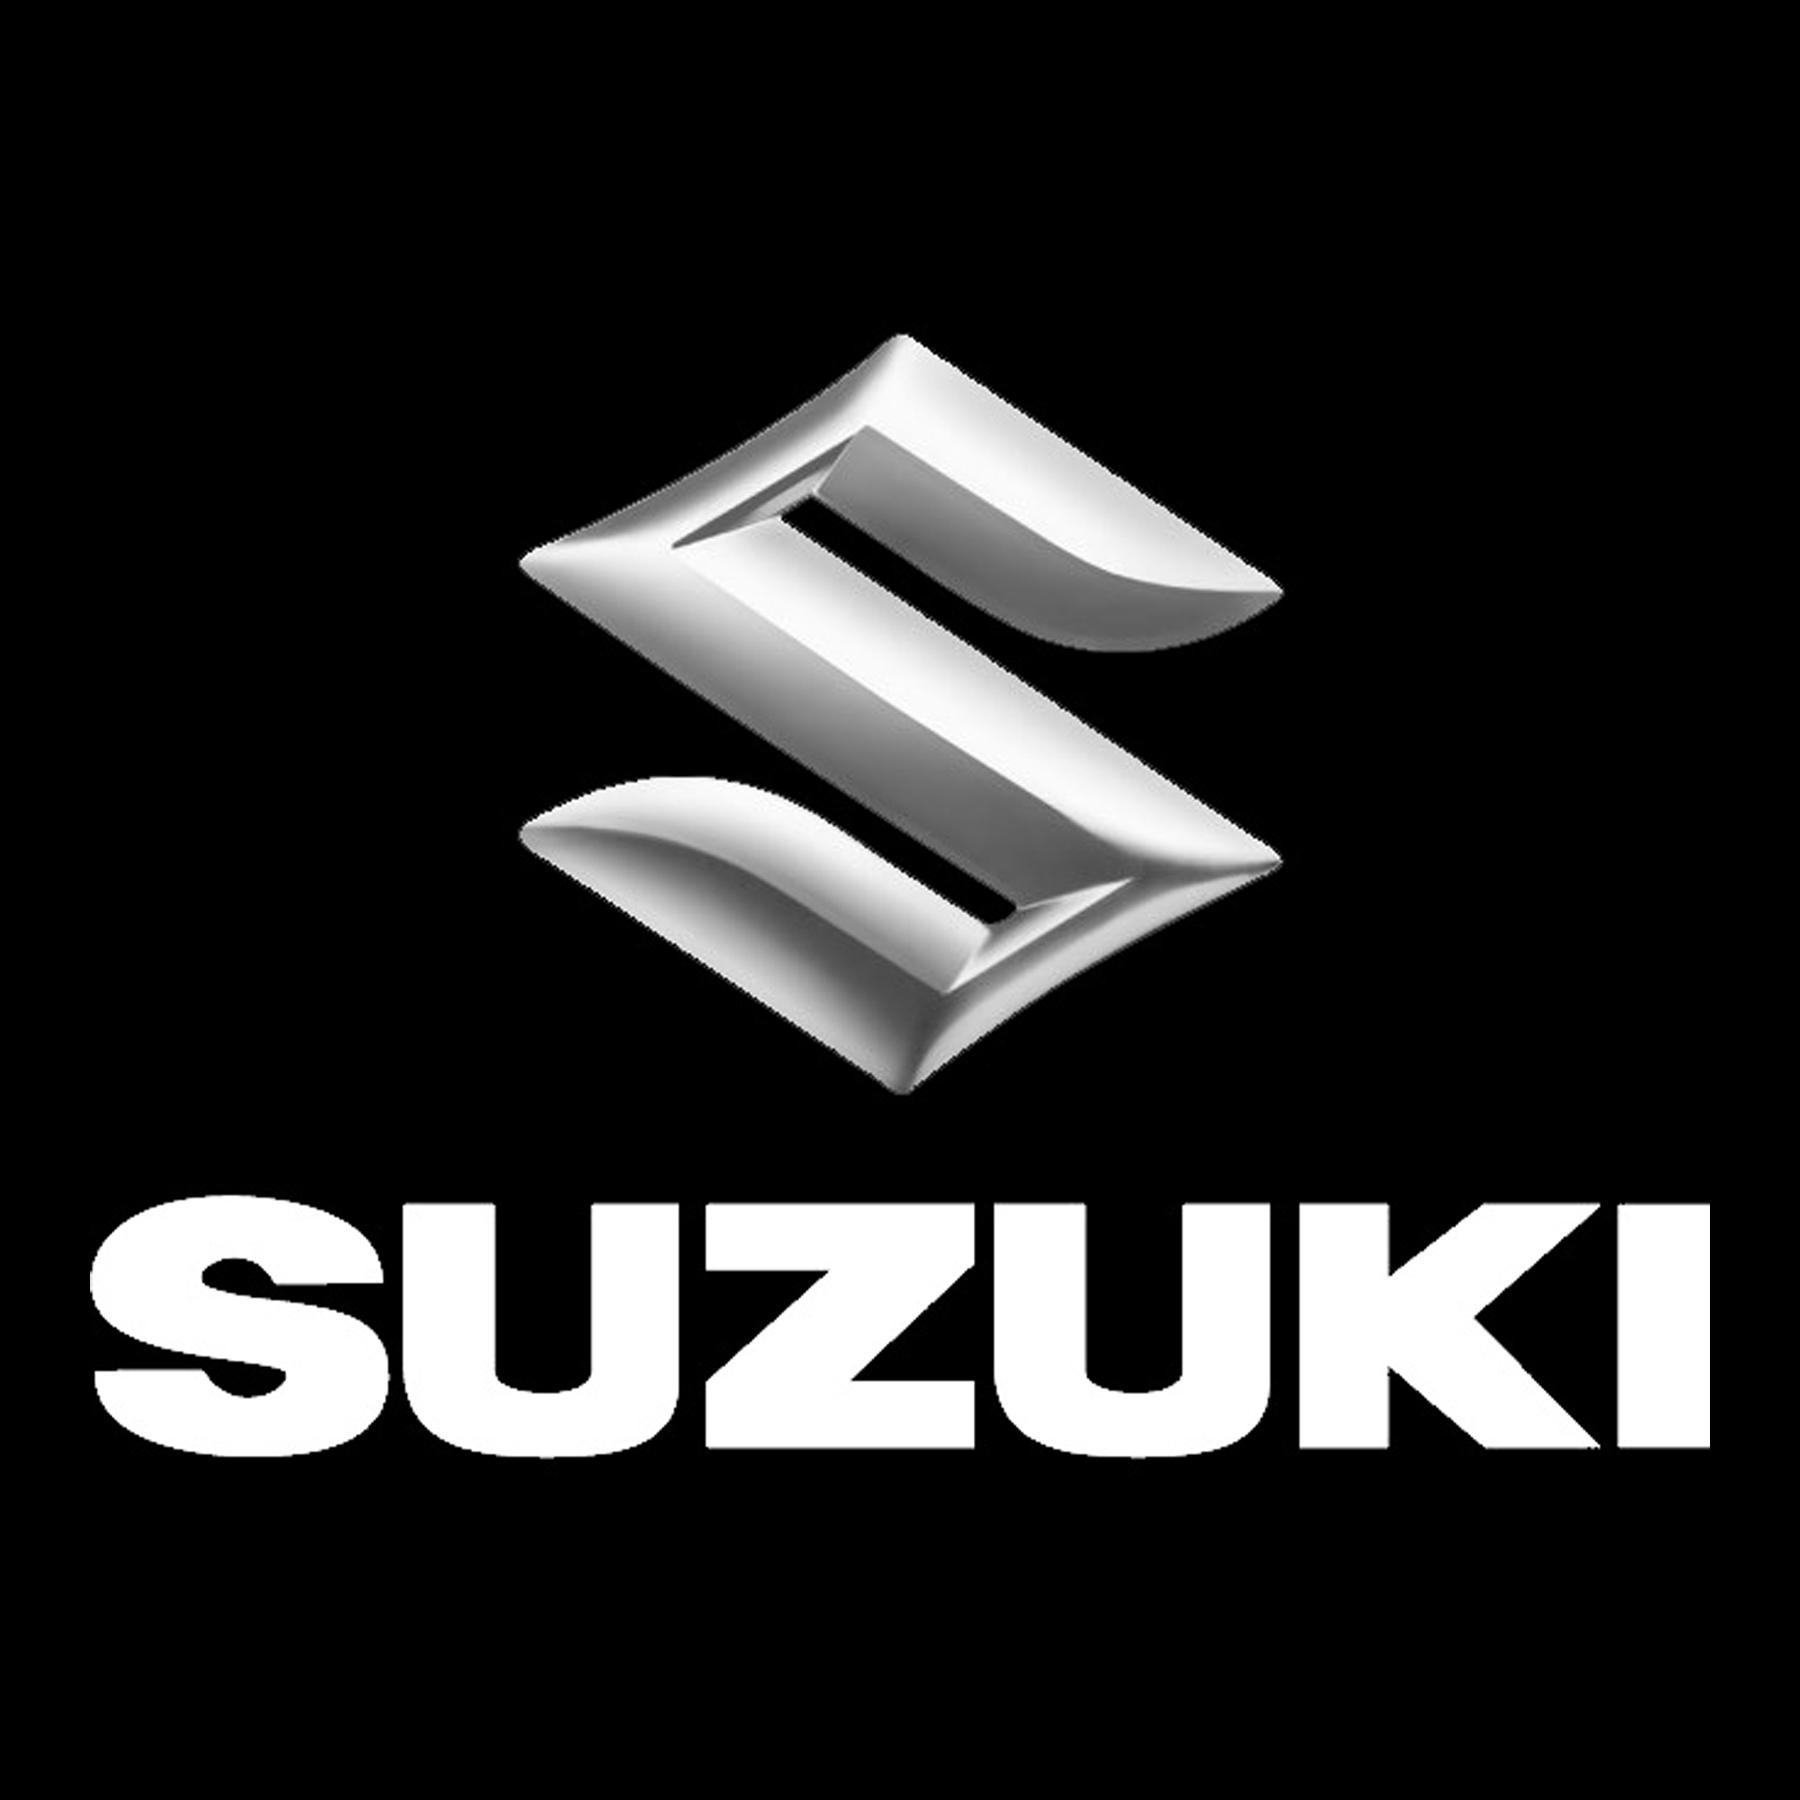 Suzuki Logo In Japanese Writing